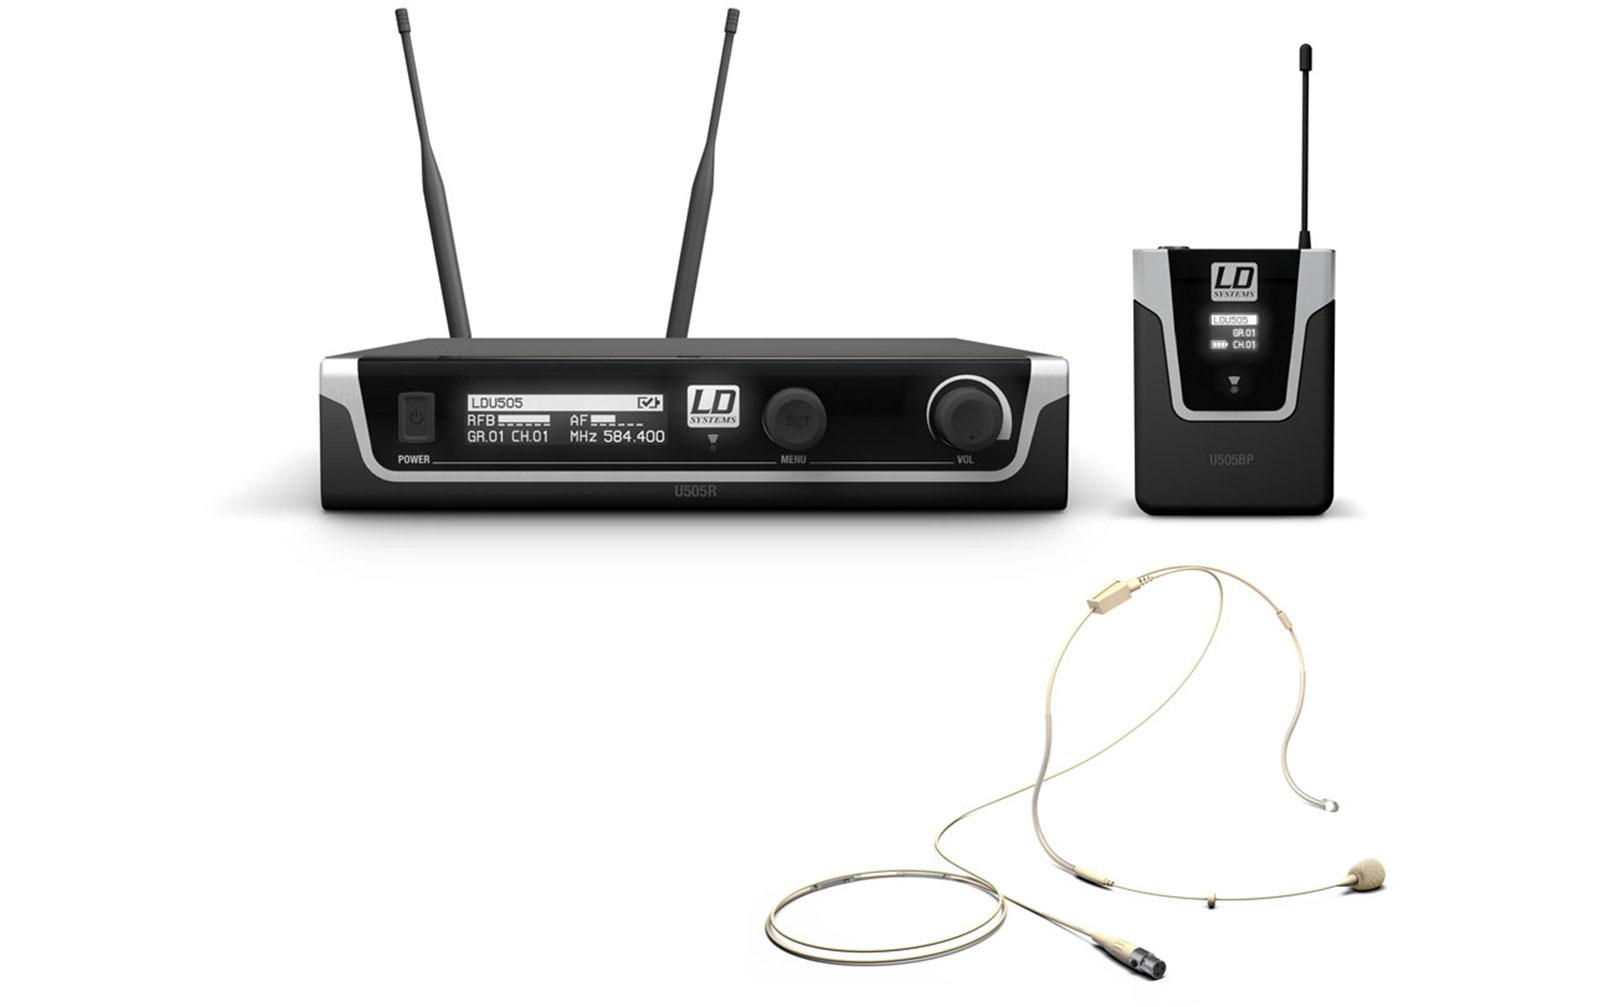 ld-systems-u505-bphh-funkmikrofon-system-mit-bodypack-und-headset-beigefarben